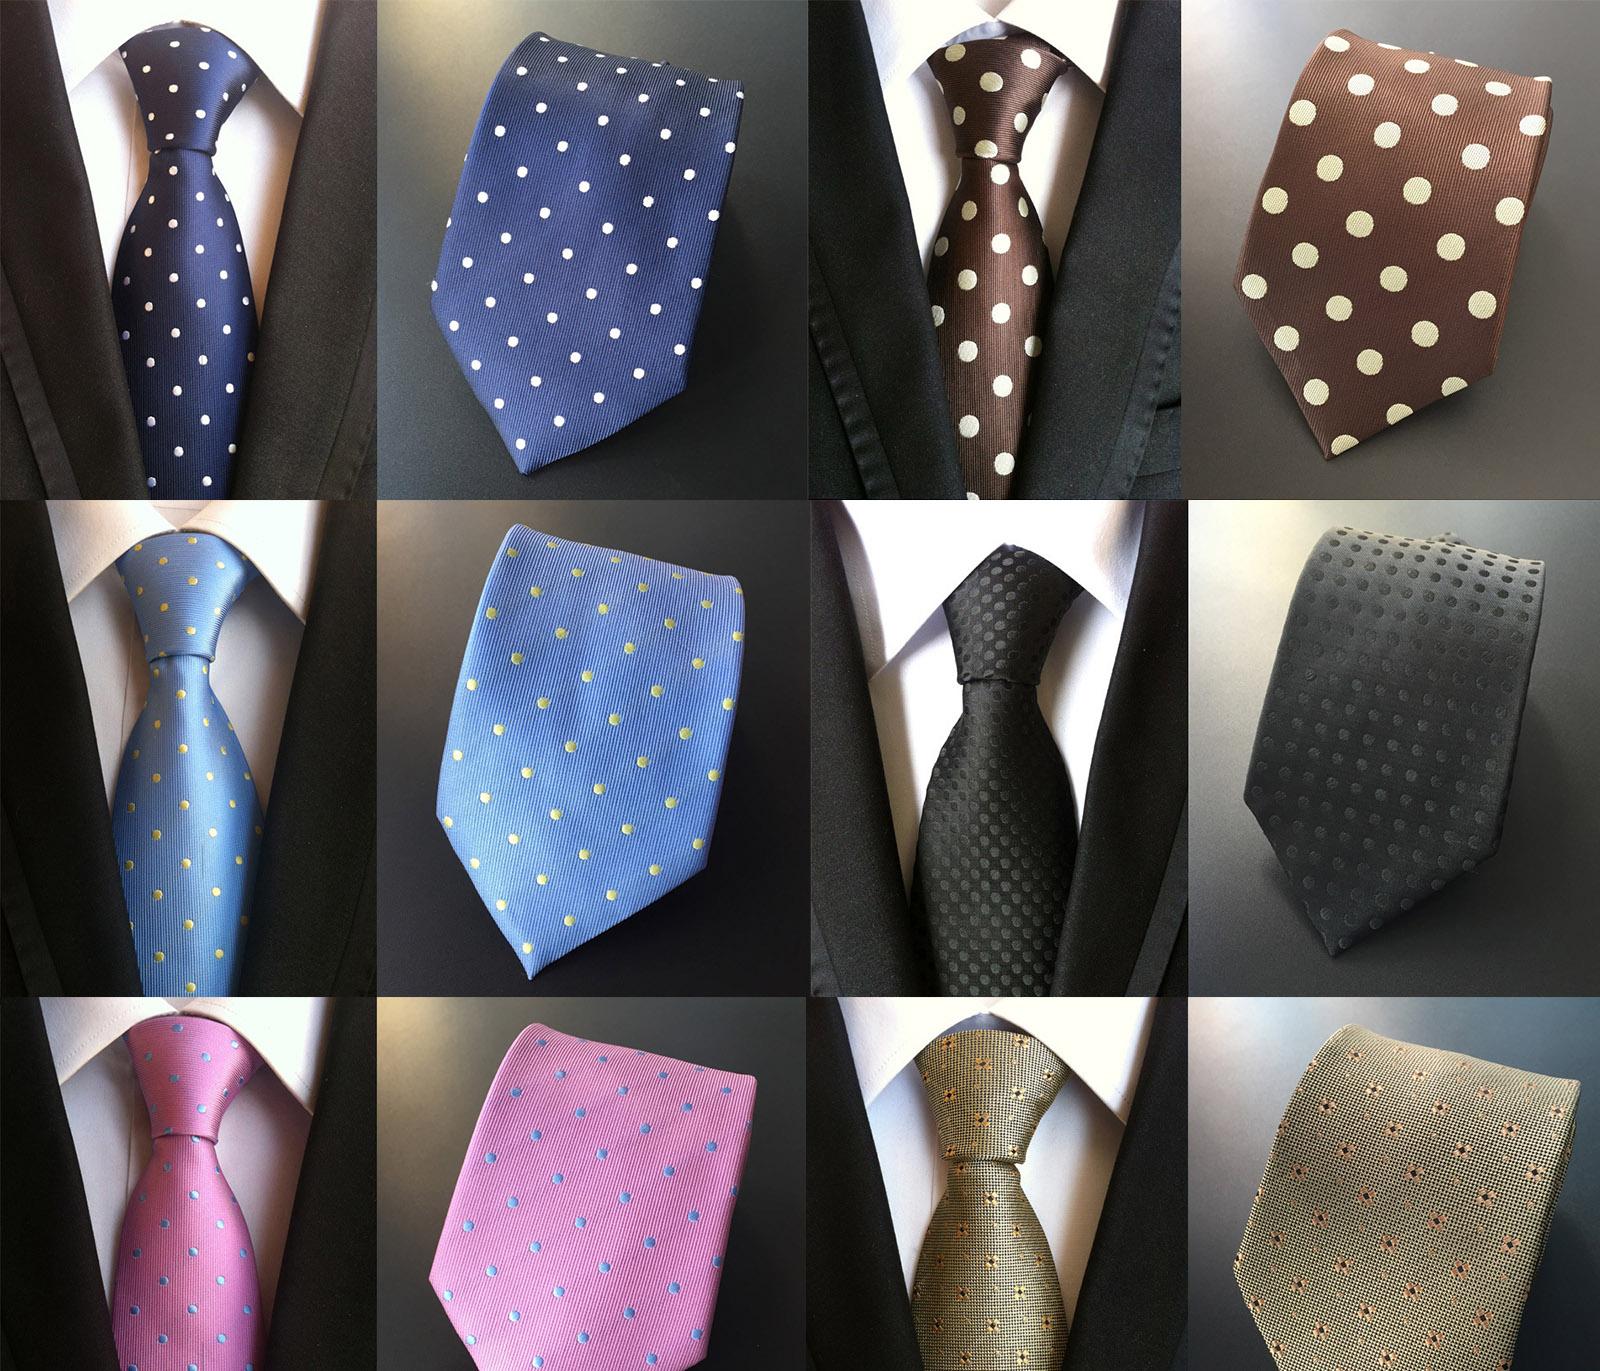 Tie mens formal dress wave point regular business dot tie suit professional Tie Red Coffee blue black